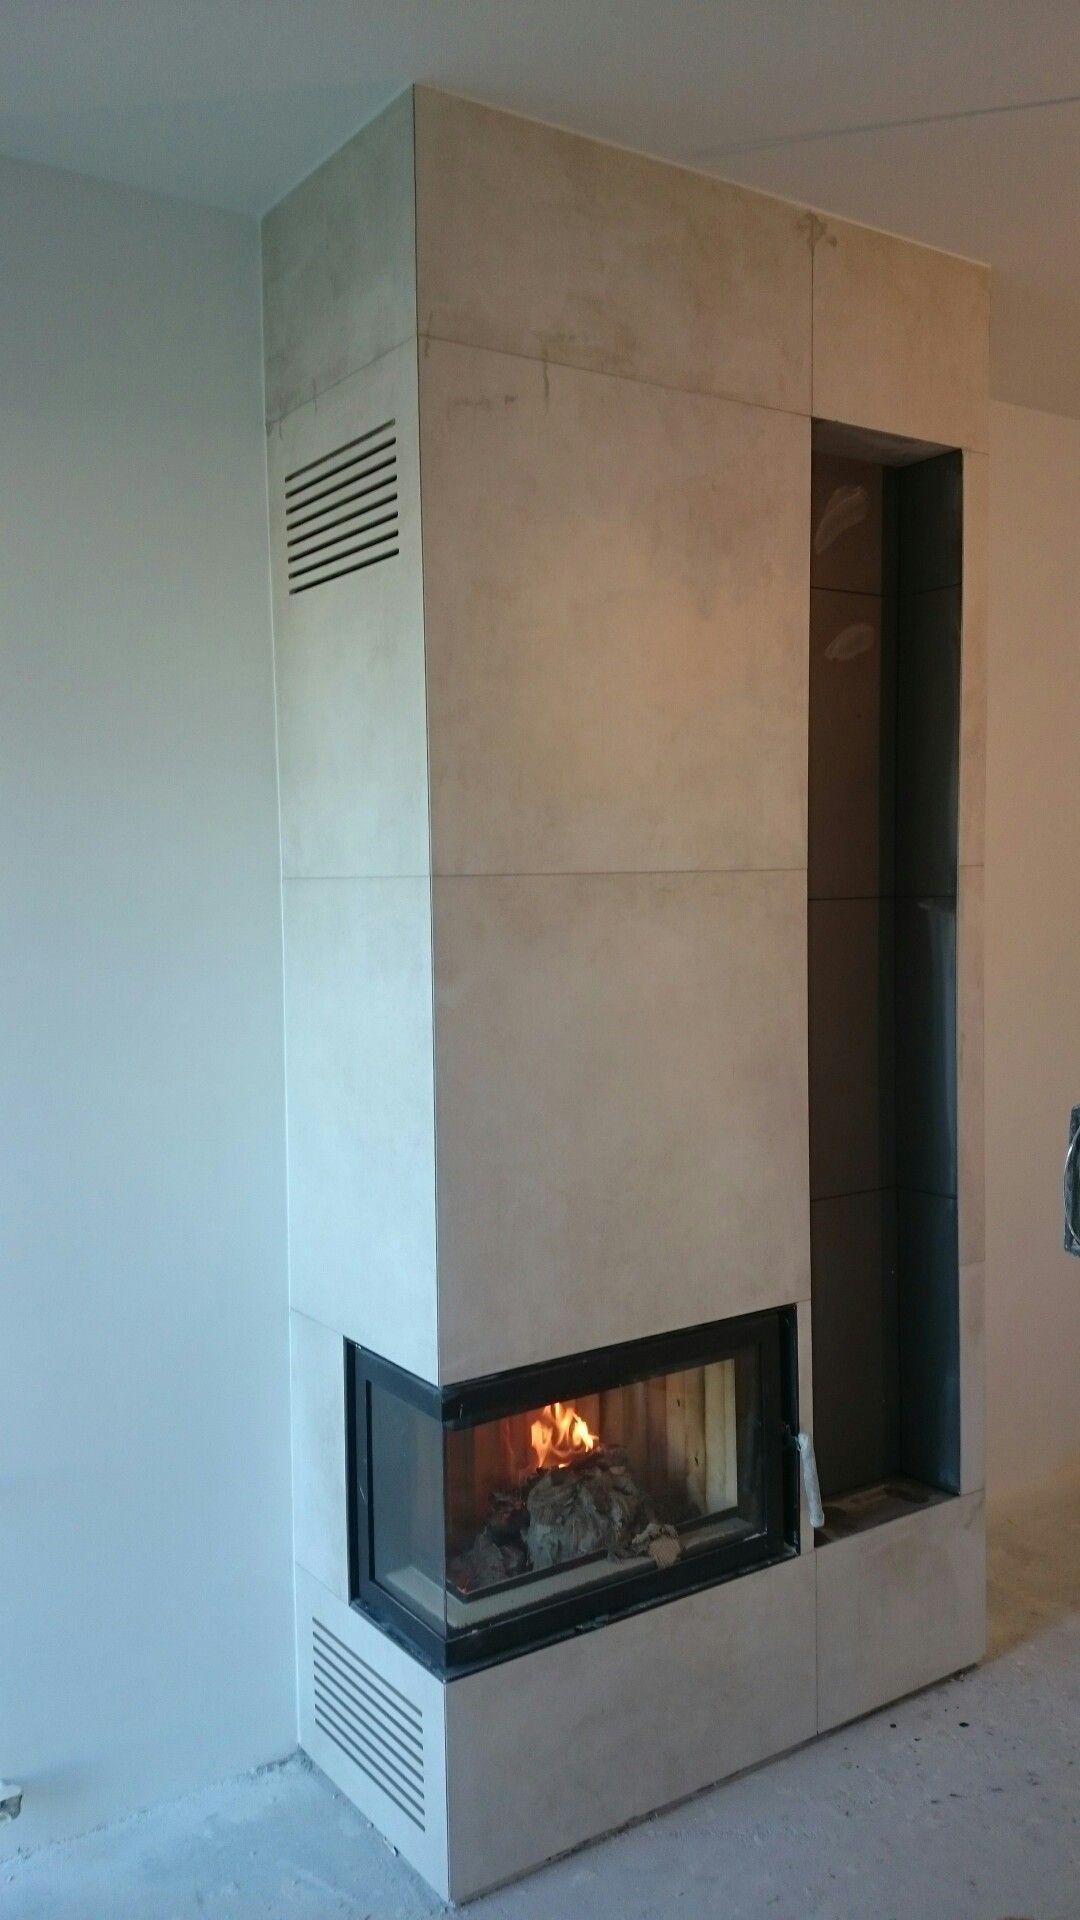 Kominek Narozny Z Wneka Na Drewno Swmm Op Pl Home Fireplace House Extension Design Indoor Fireplace